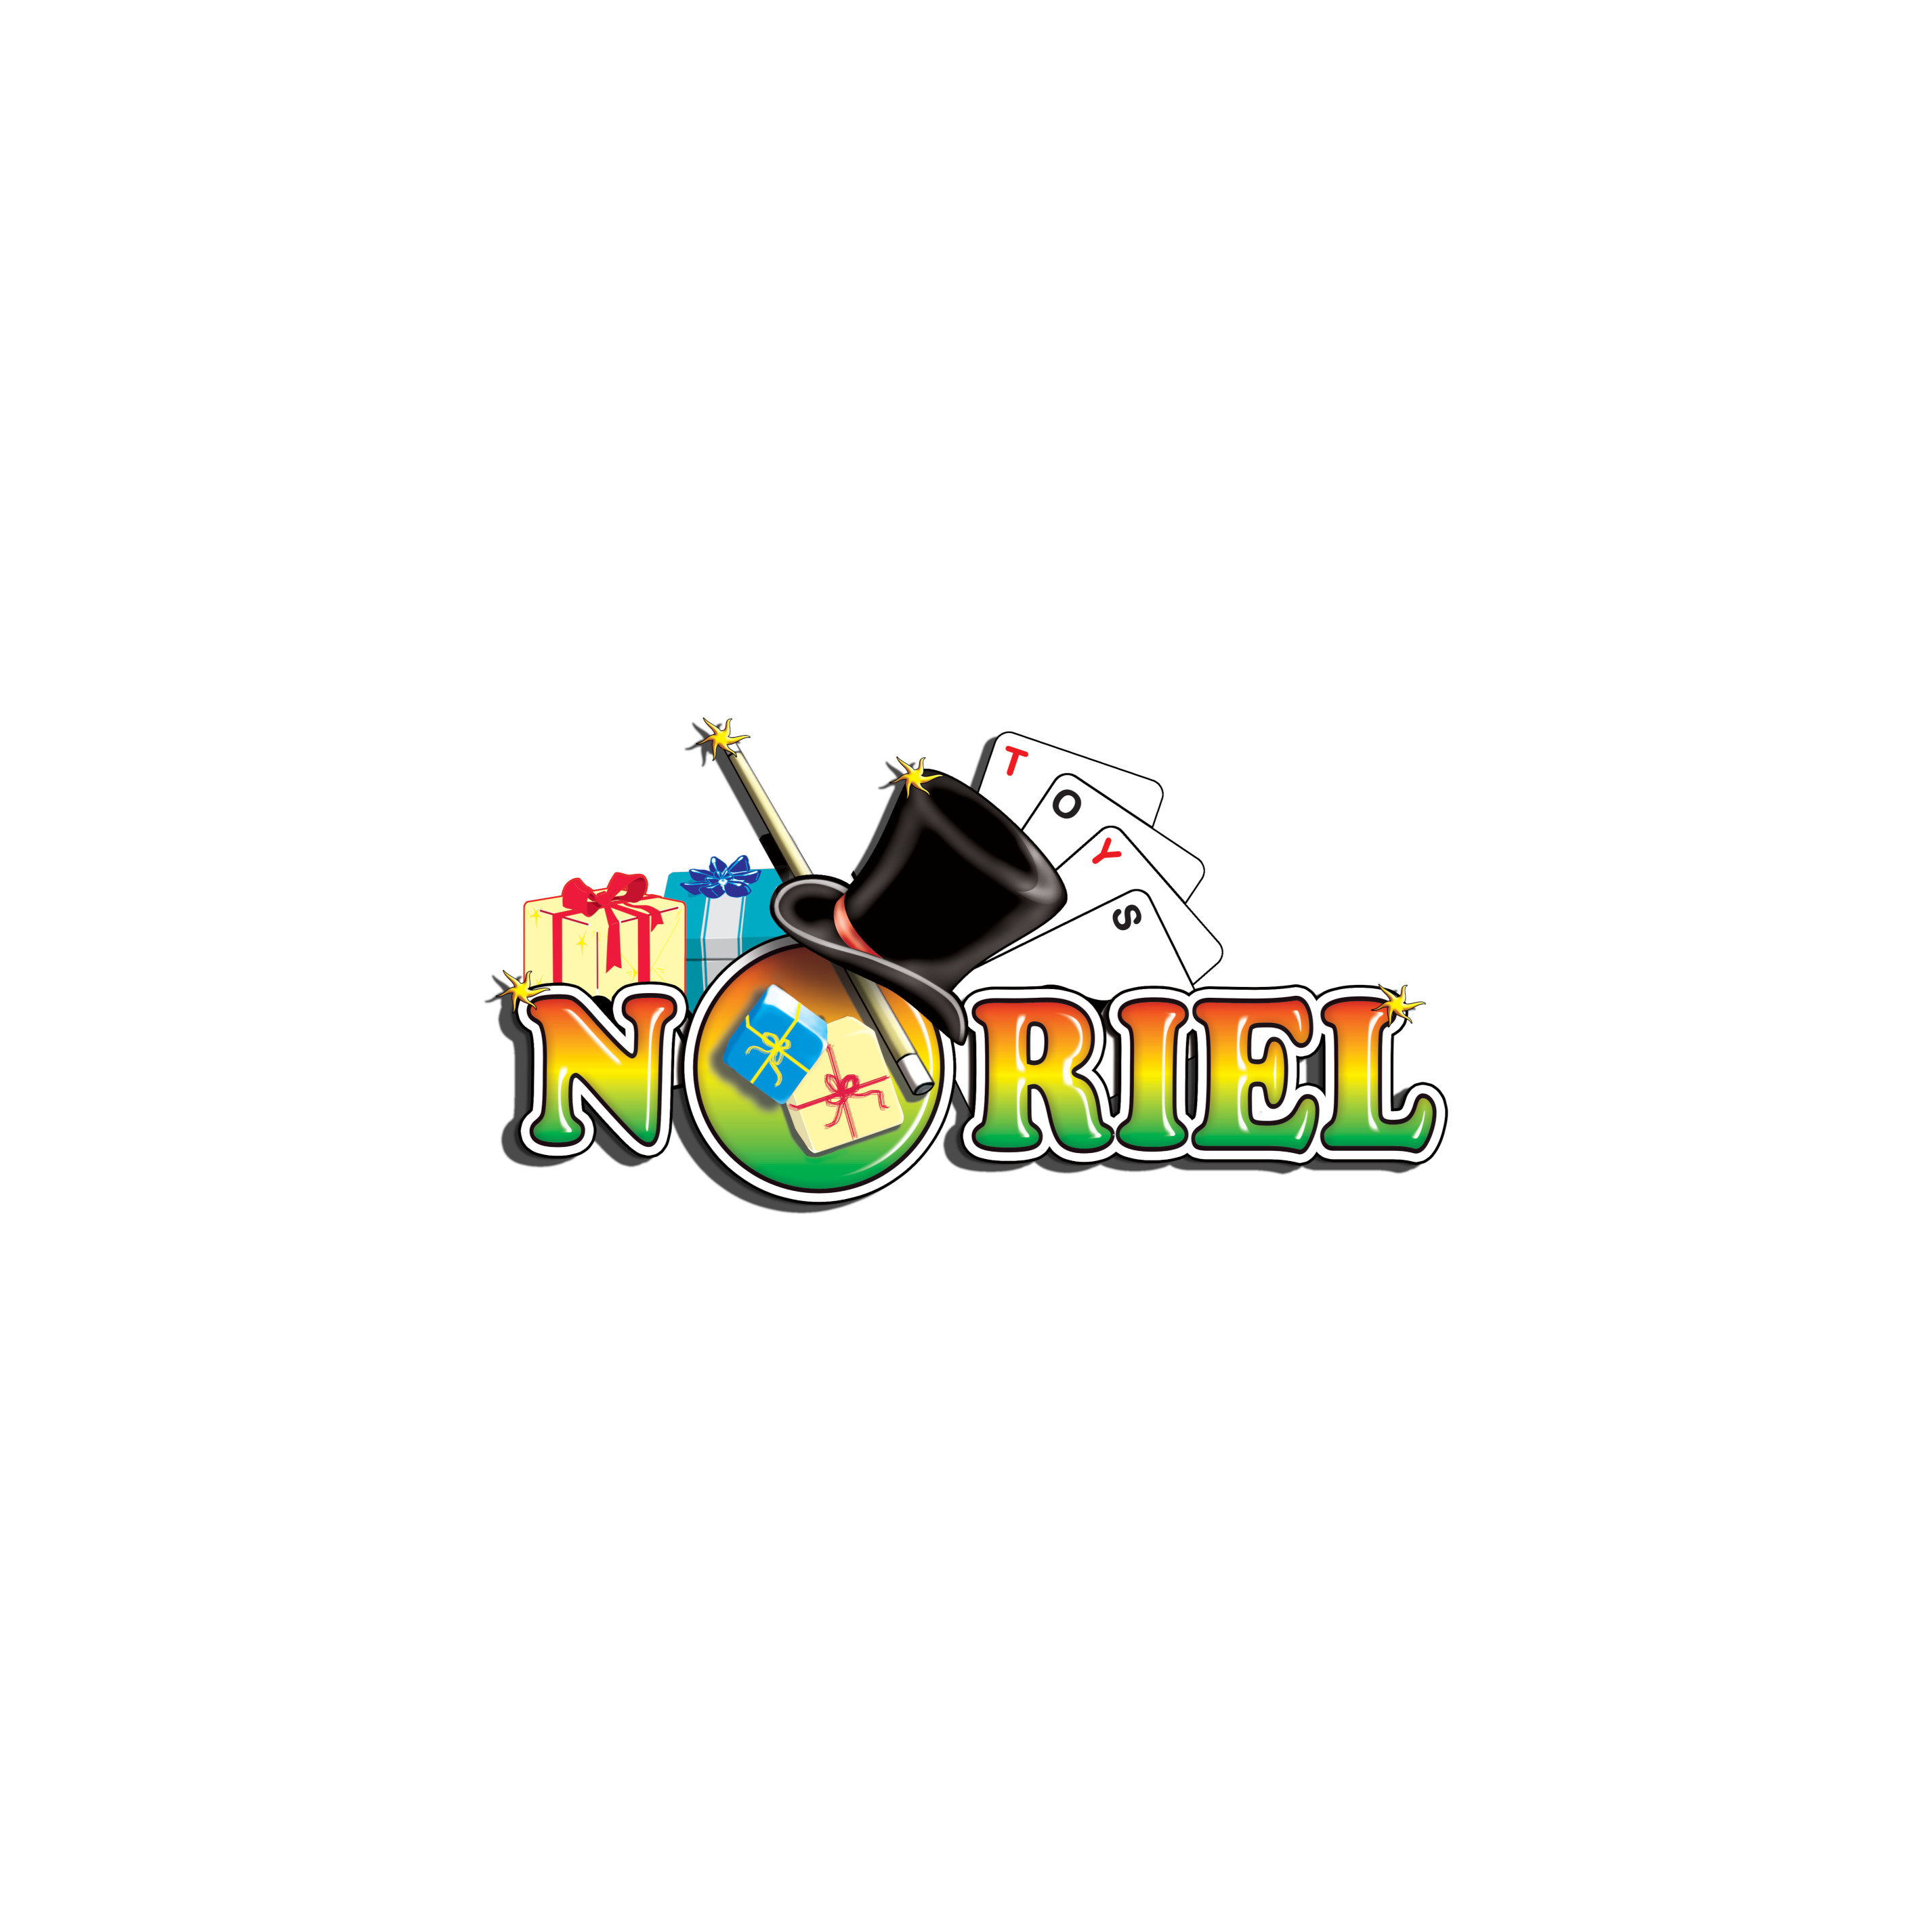 LG10765_001 LEGO® Juniors - Concertul subacvatic al lui Ariel (10765)